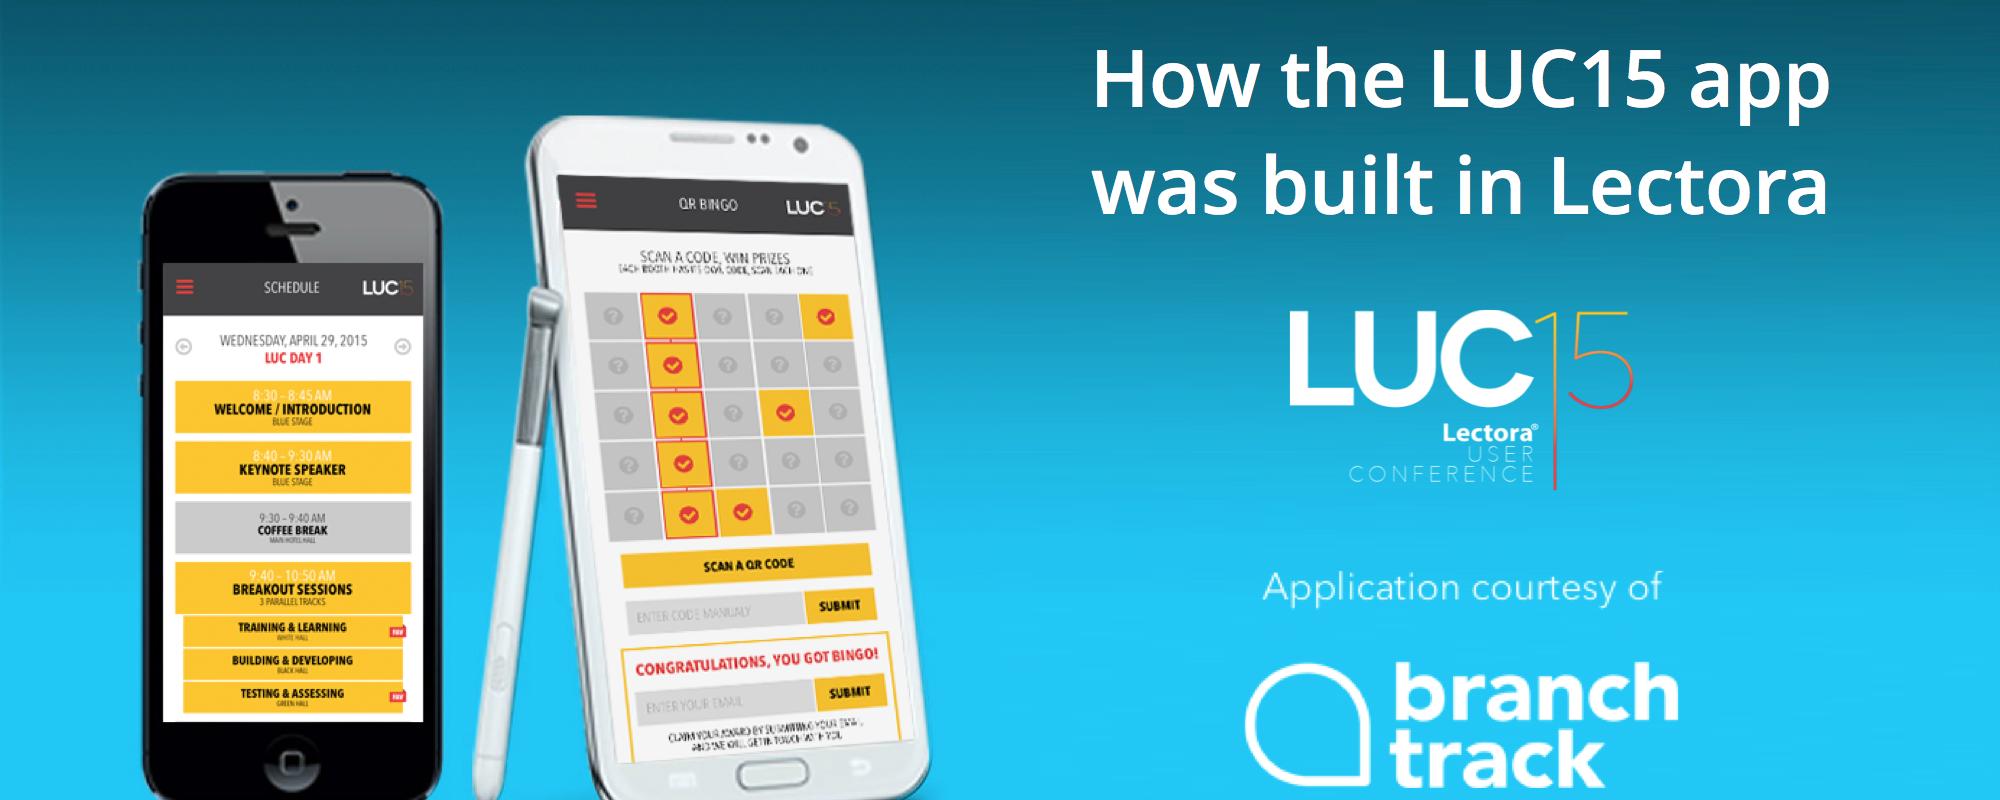 Lectora User Conference App (2015)